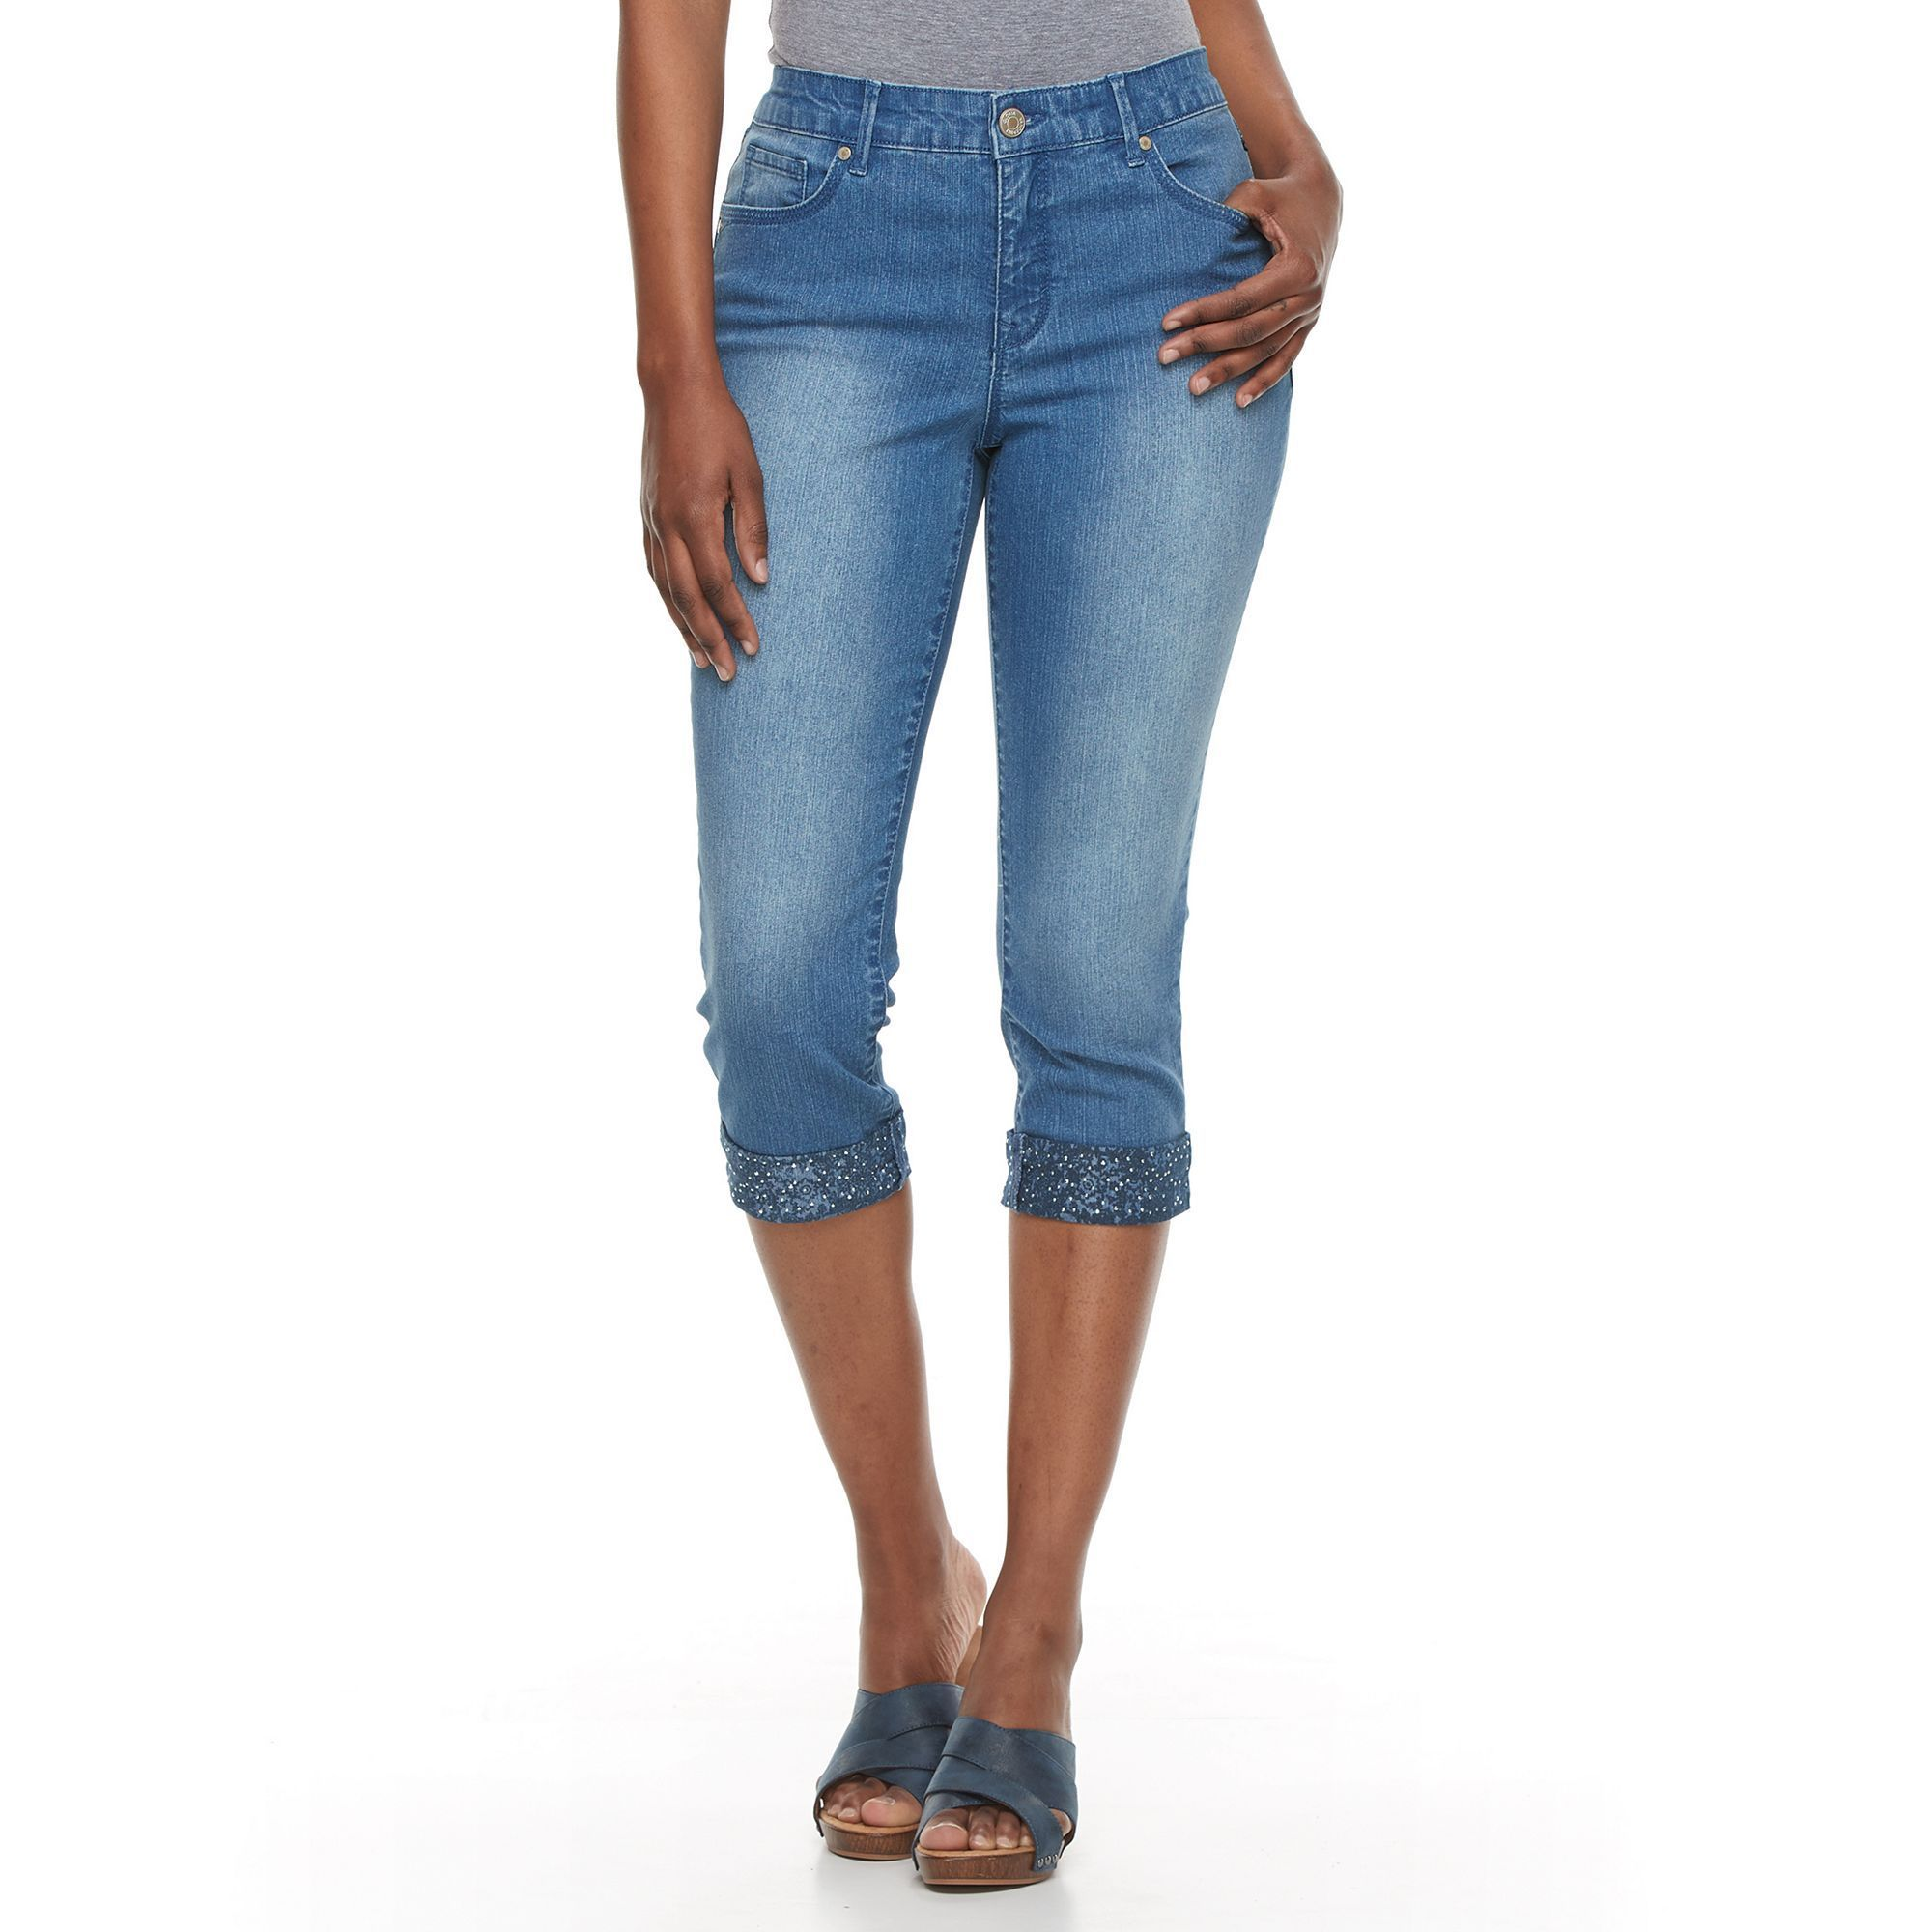 be14dd282c9 Women's Gloria Vanderbilt Jordyn Embellished Capri Jeans, Size: 12, Blue